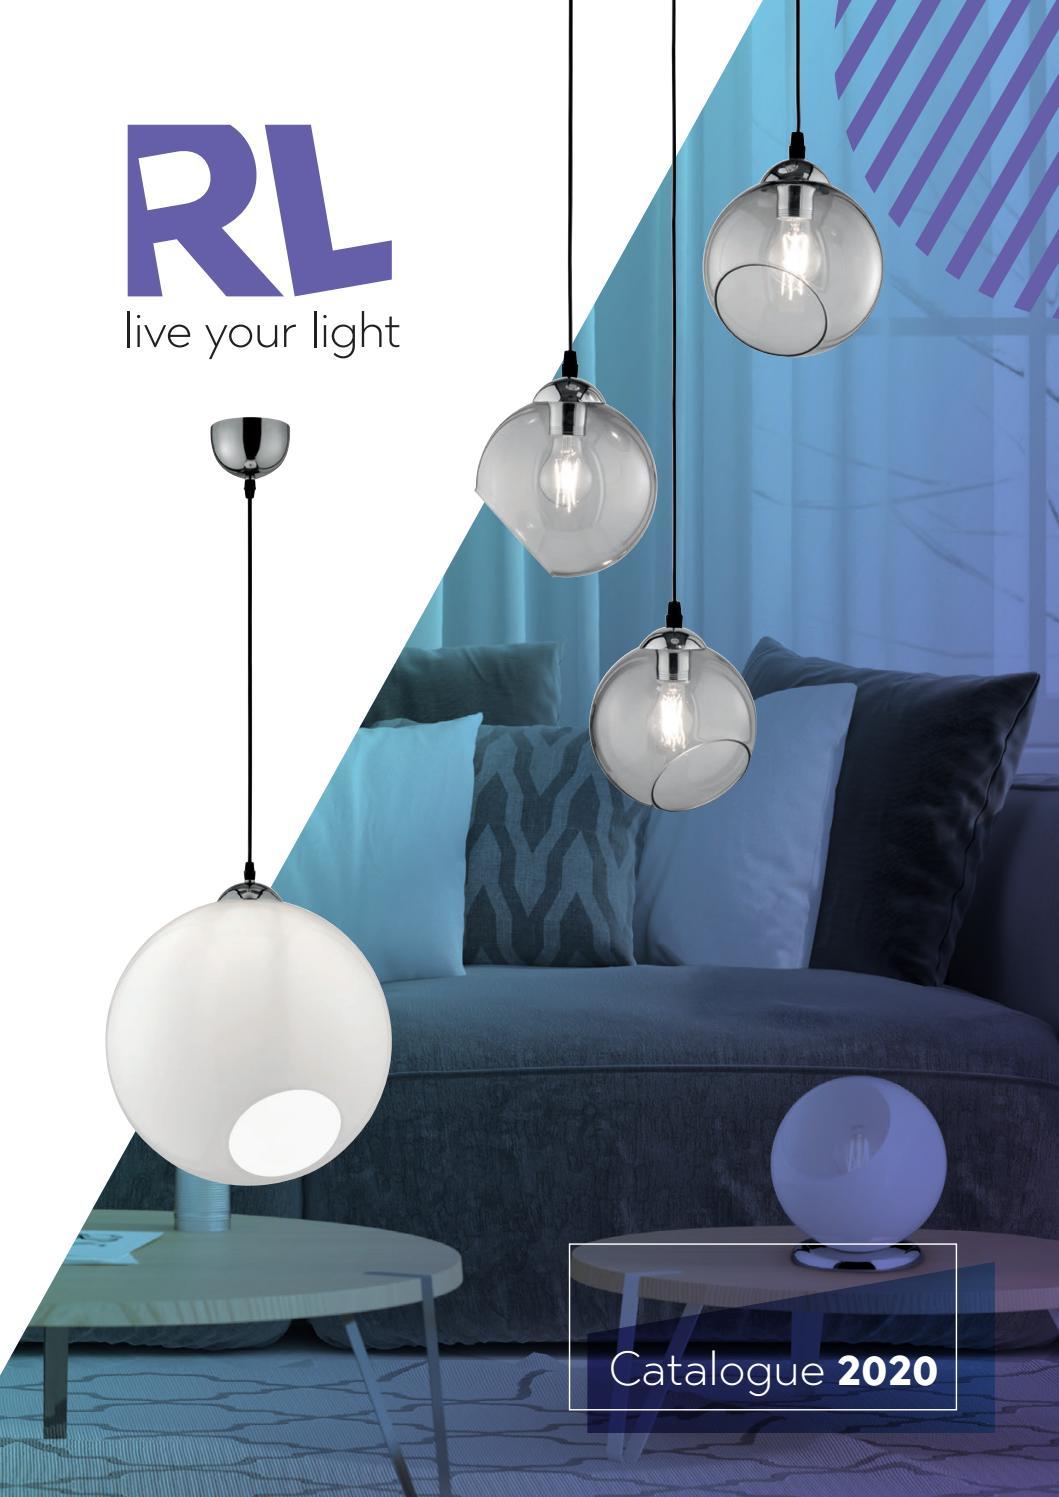 RL lighting